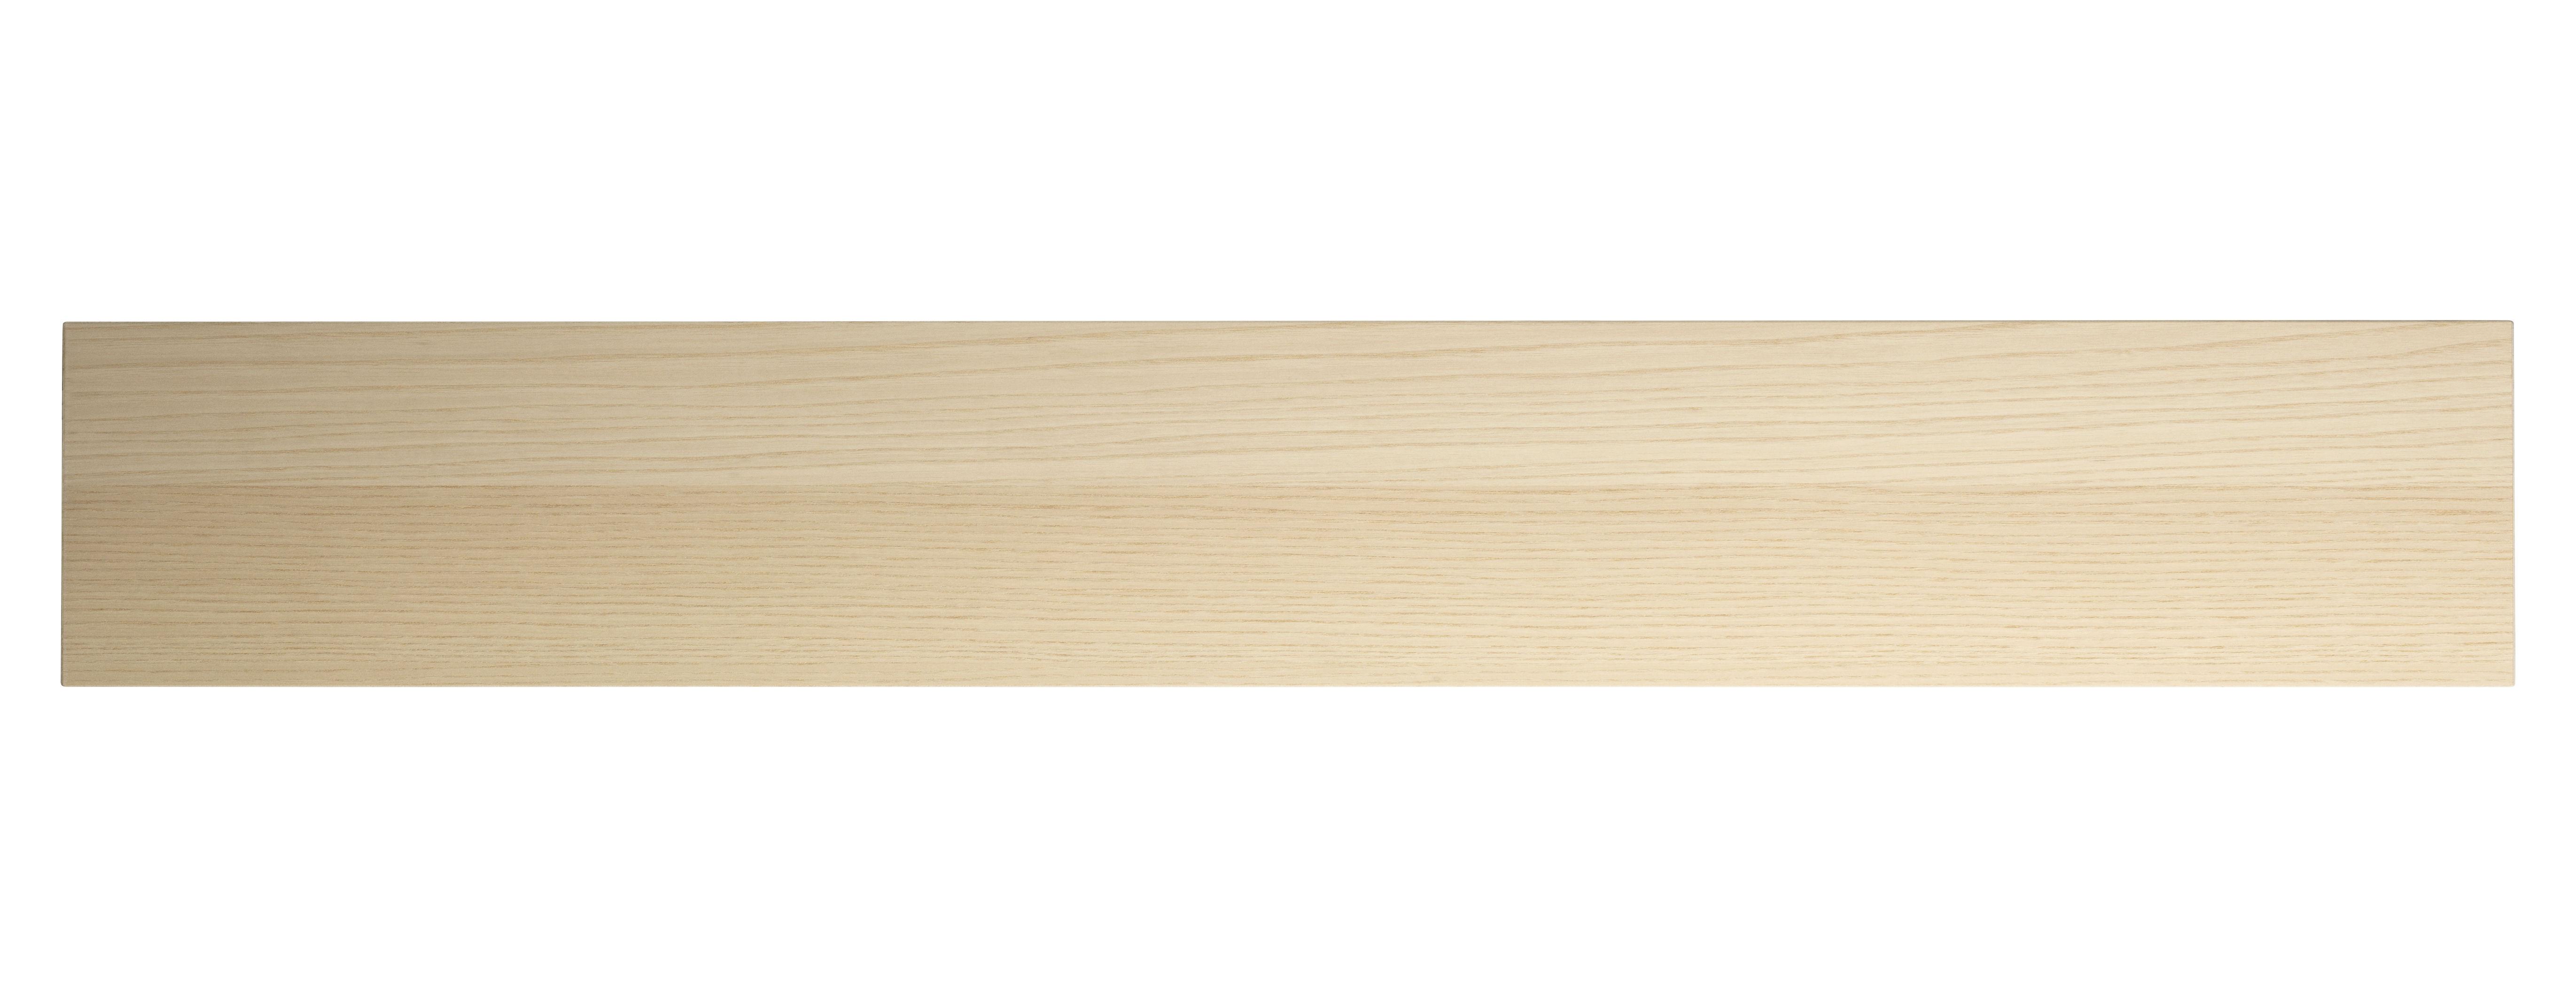 Furniture - Bookcases & Bookshelves - Plio Shelf - Oak - L 160 cm by Presse citron - Oak - Solid oak